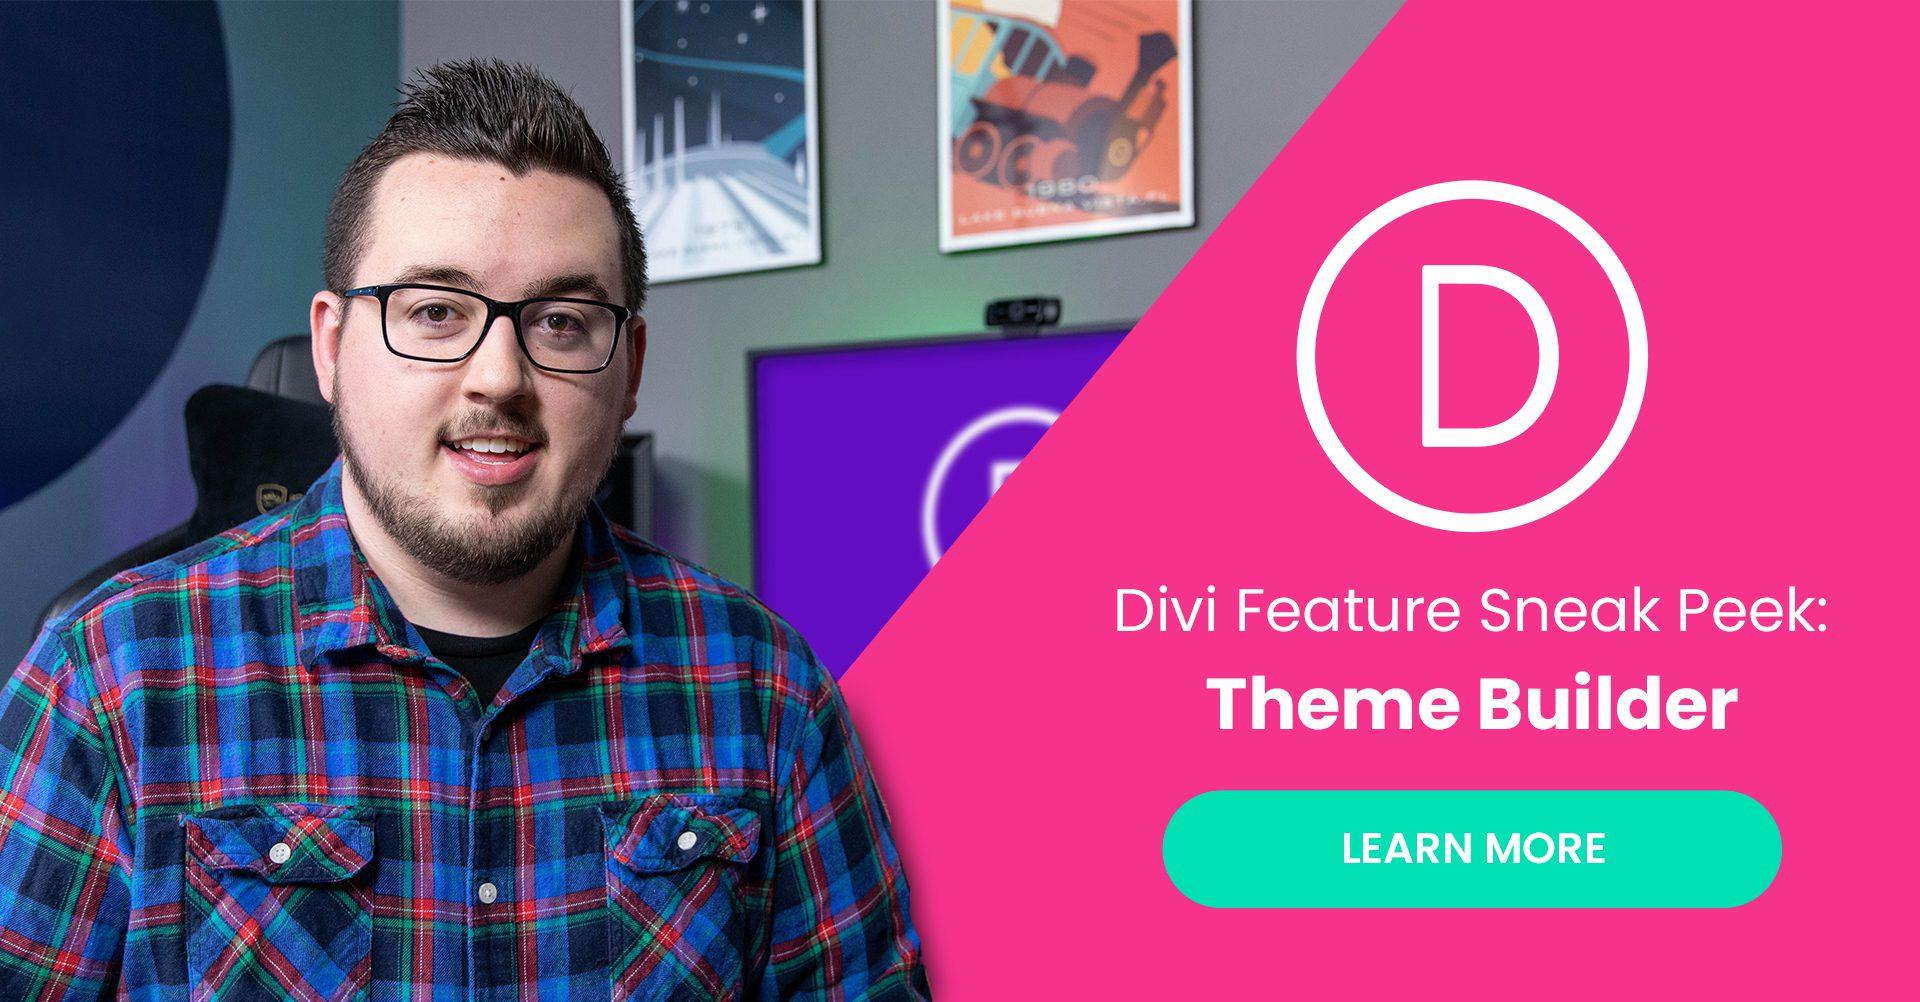 Divi Feature Sneak Peek: The Divi Theme Builder